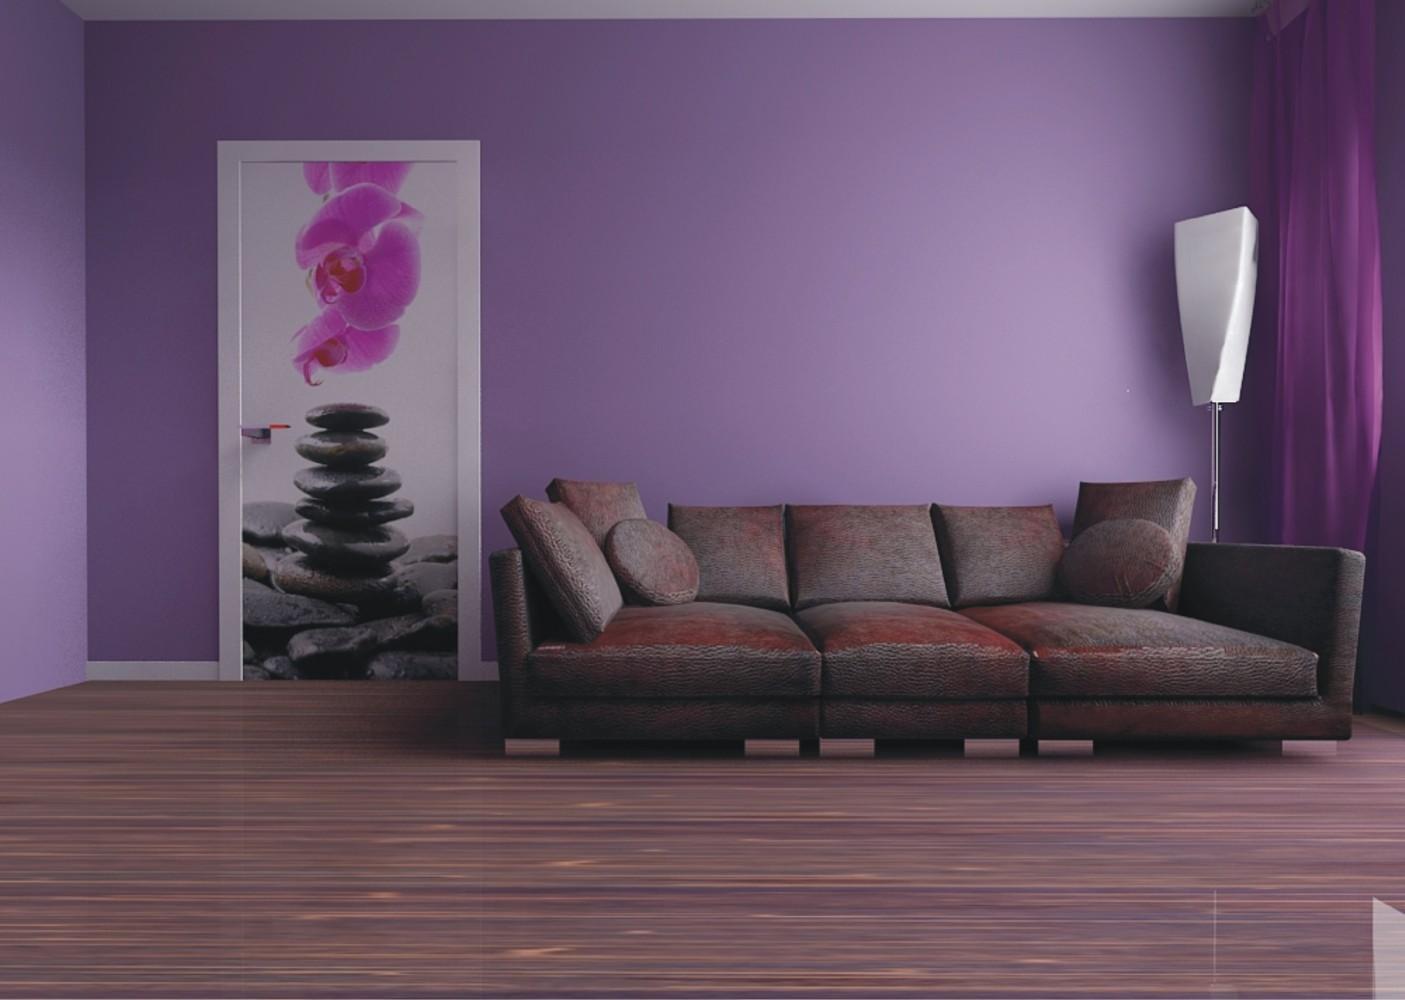 T rtapete fototapete tapete lila orchidee steine wellness - Lo ultimo en pinturas para interiores ...